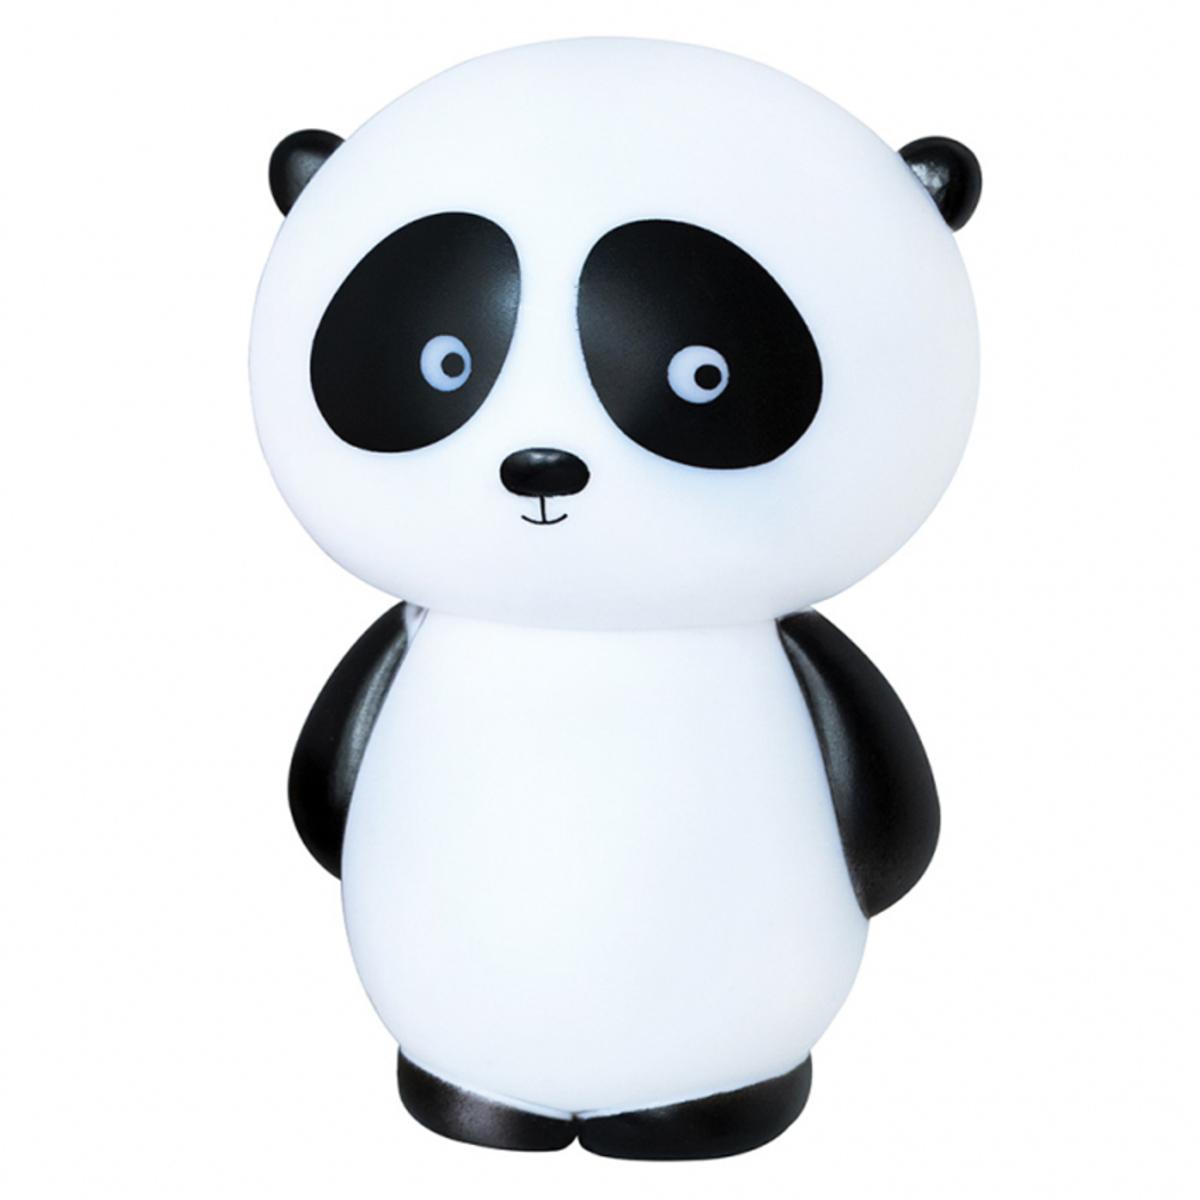 Veilleuse Veilleuse Panda Veilleuse Panda